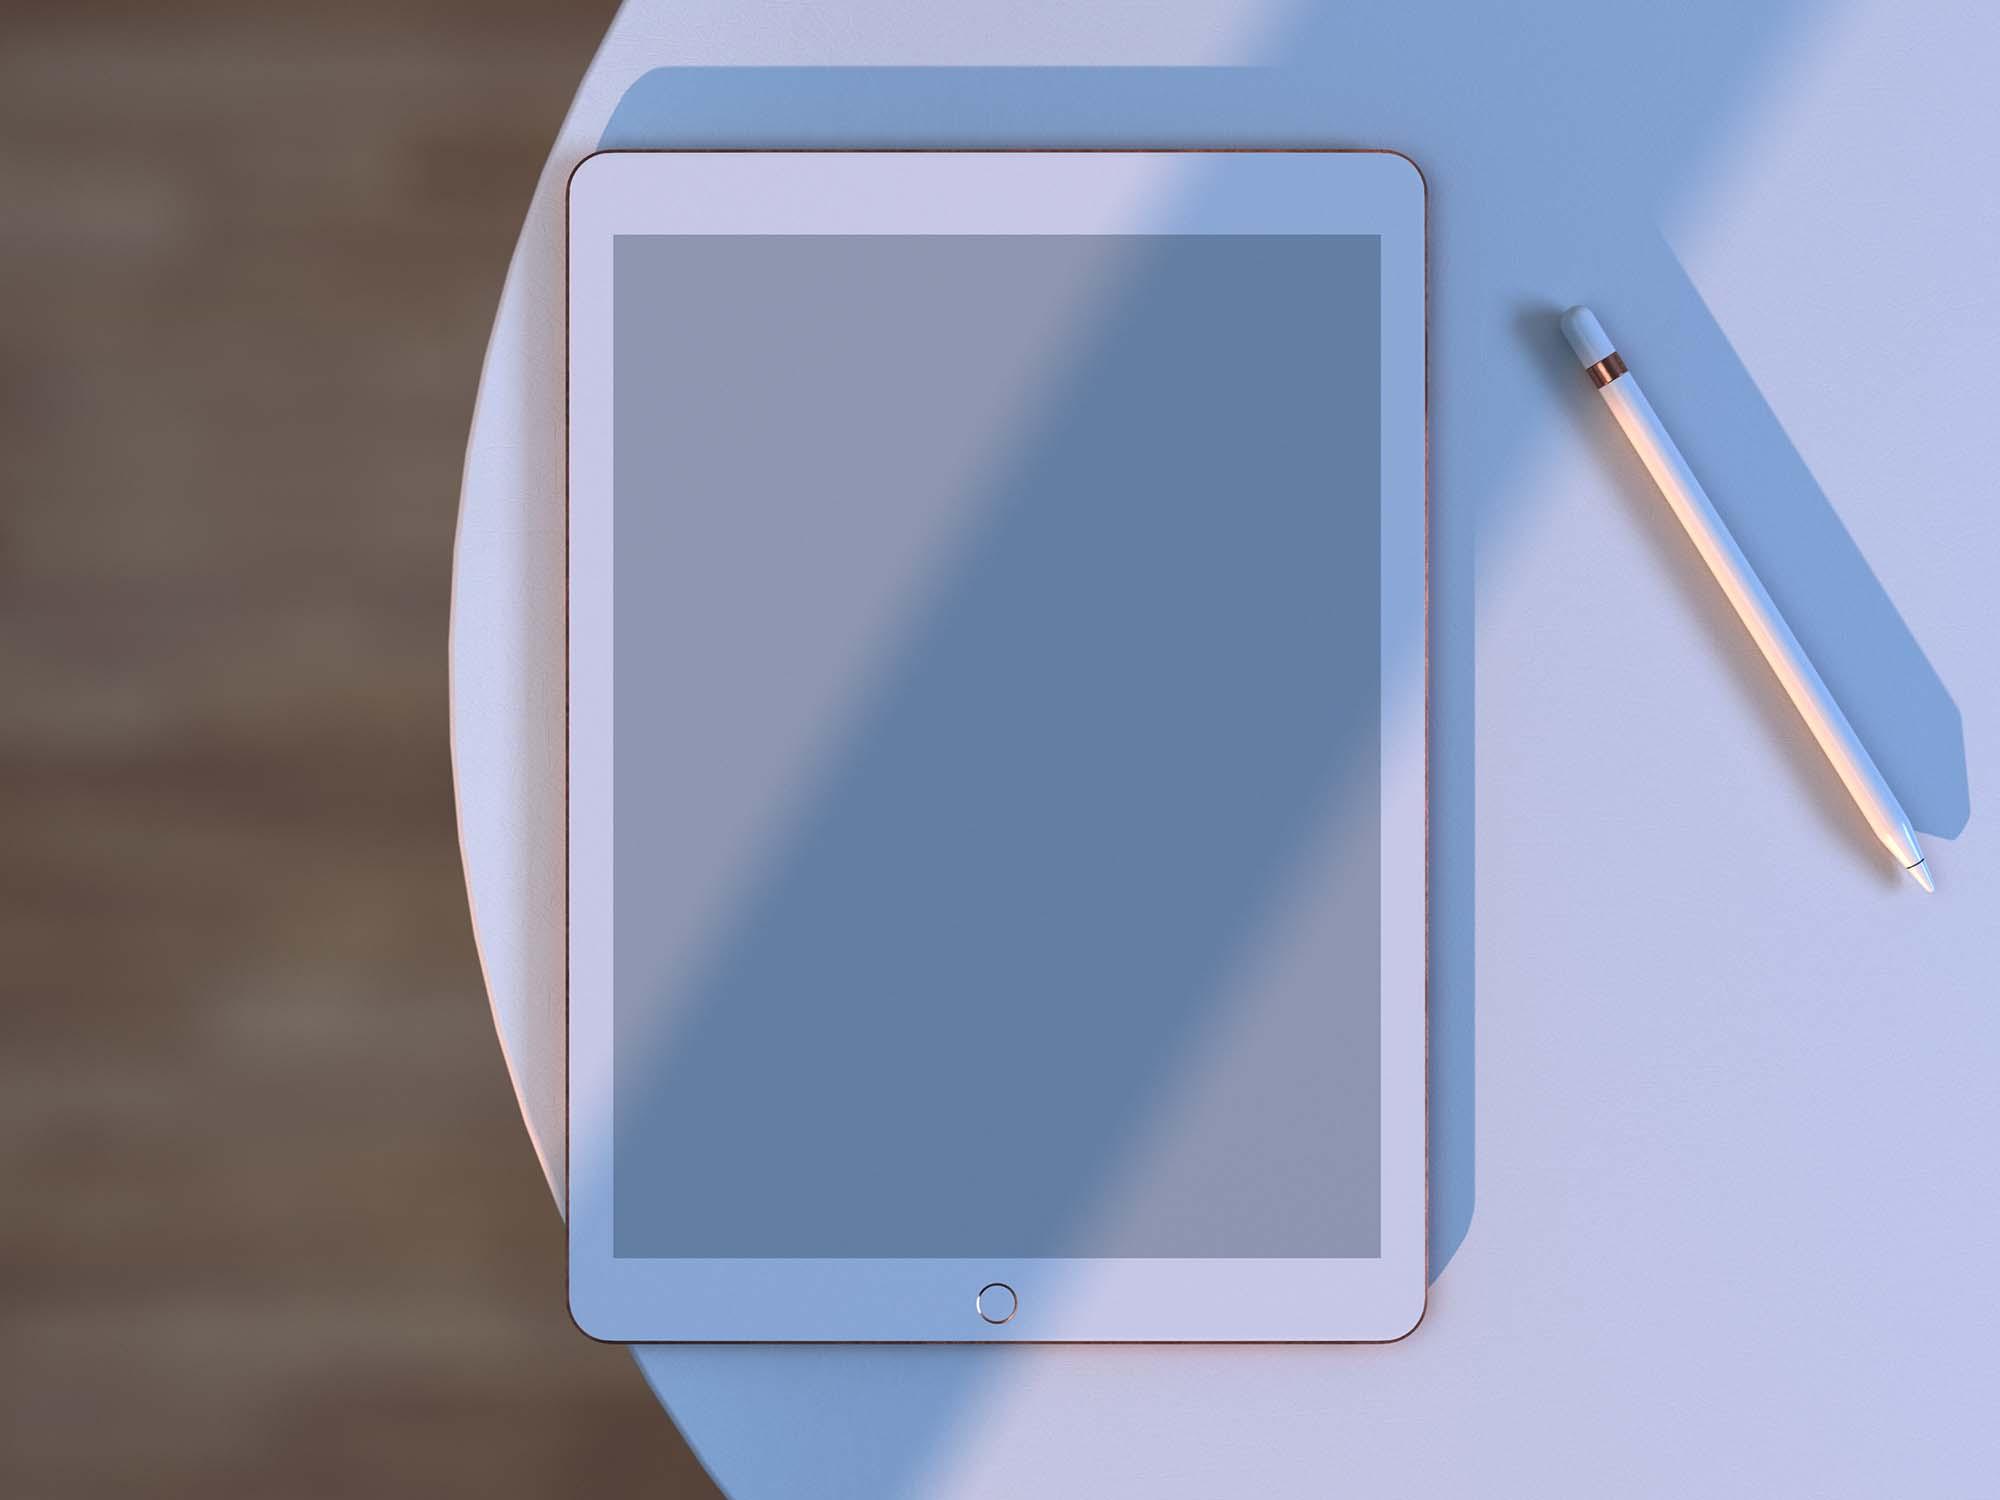 iPad Tablet Mockup 2